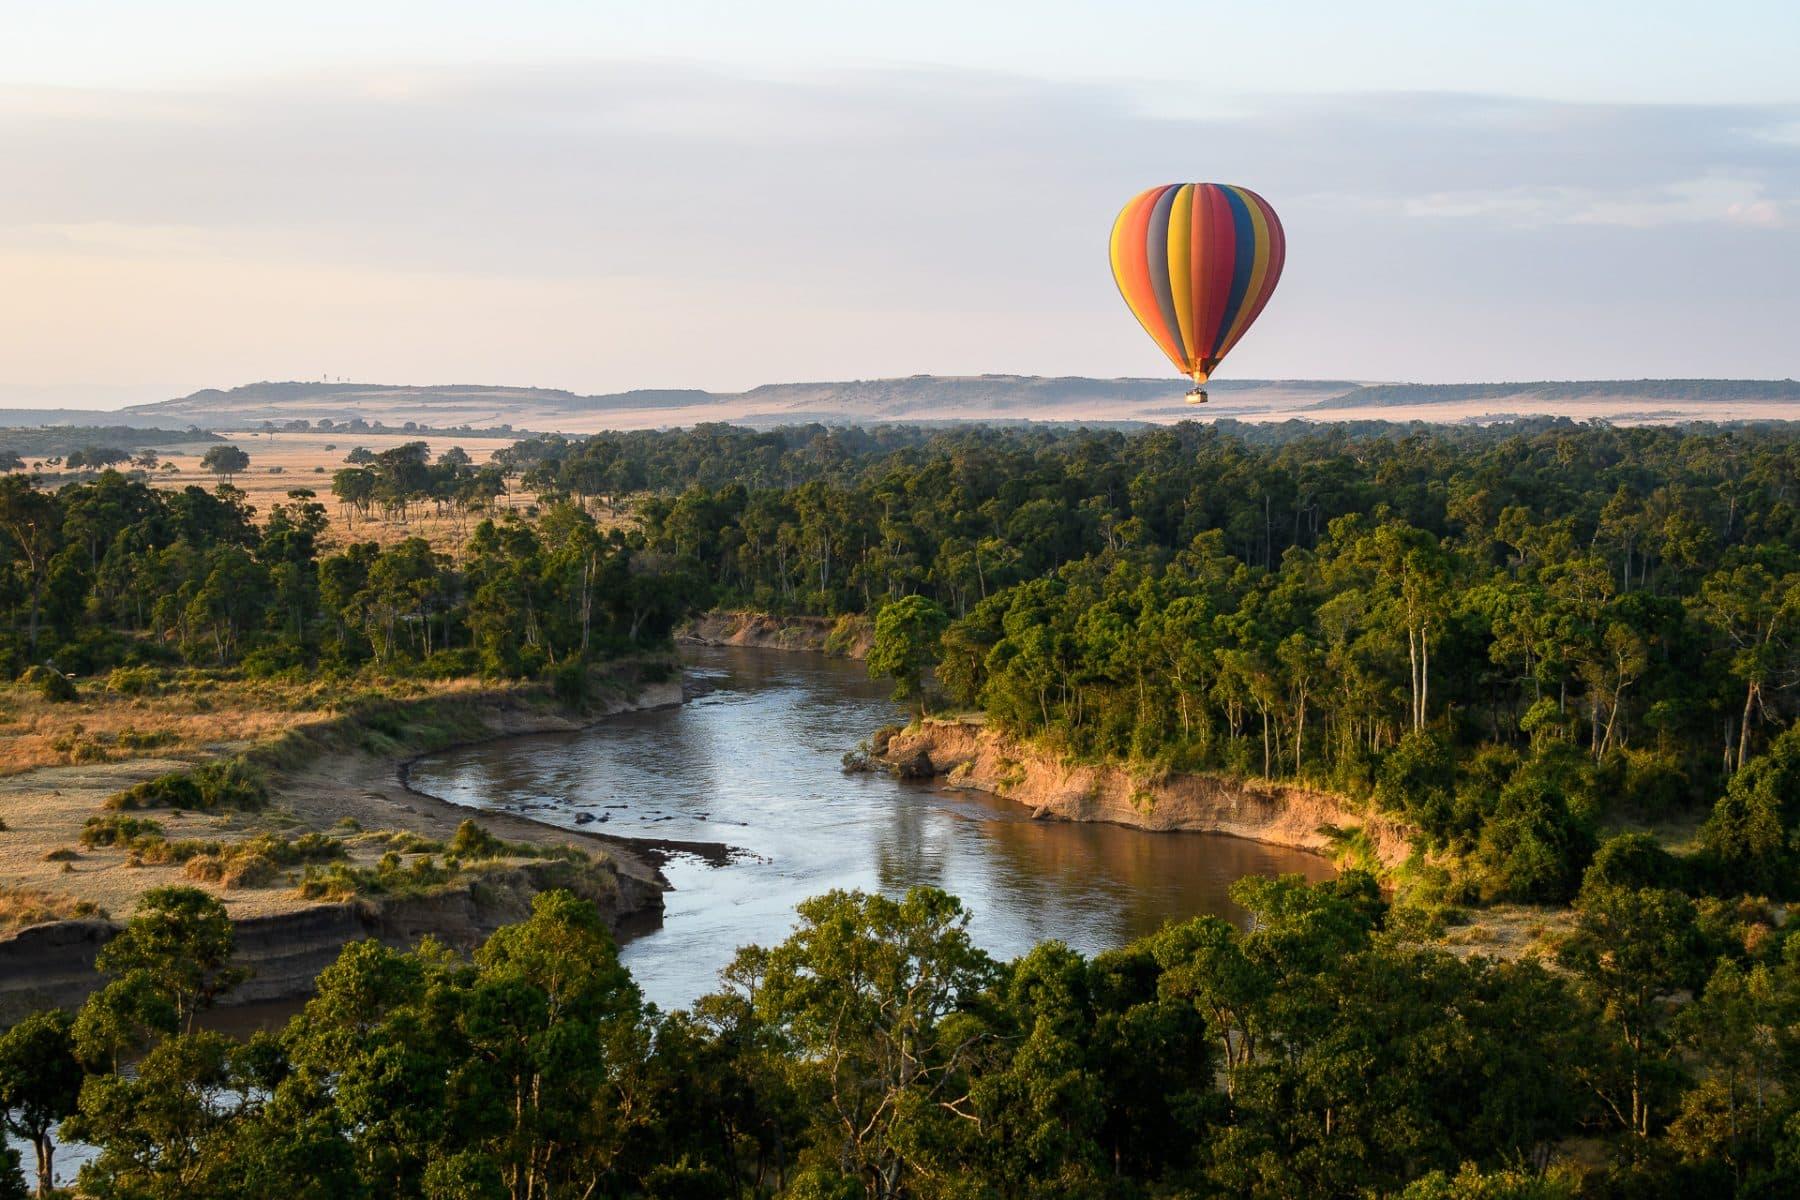 Kenya Beach & Bush Safari hot air balloon